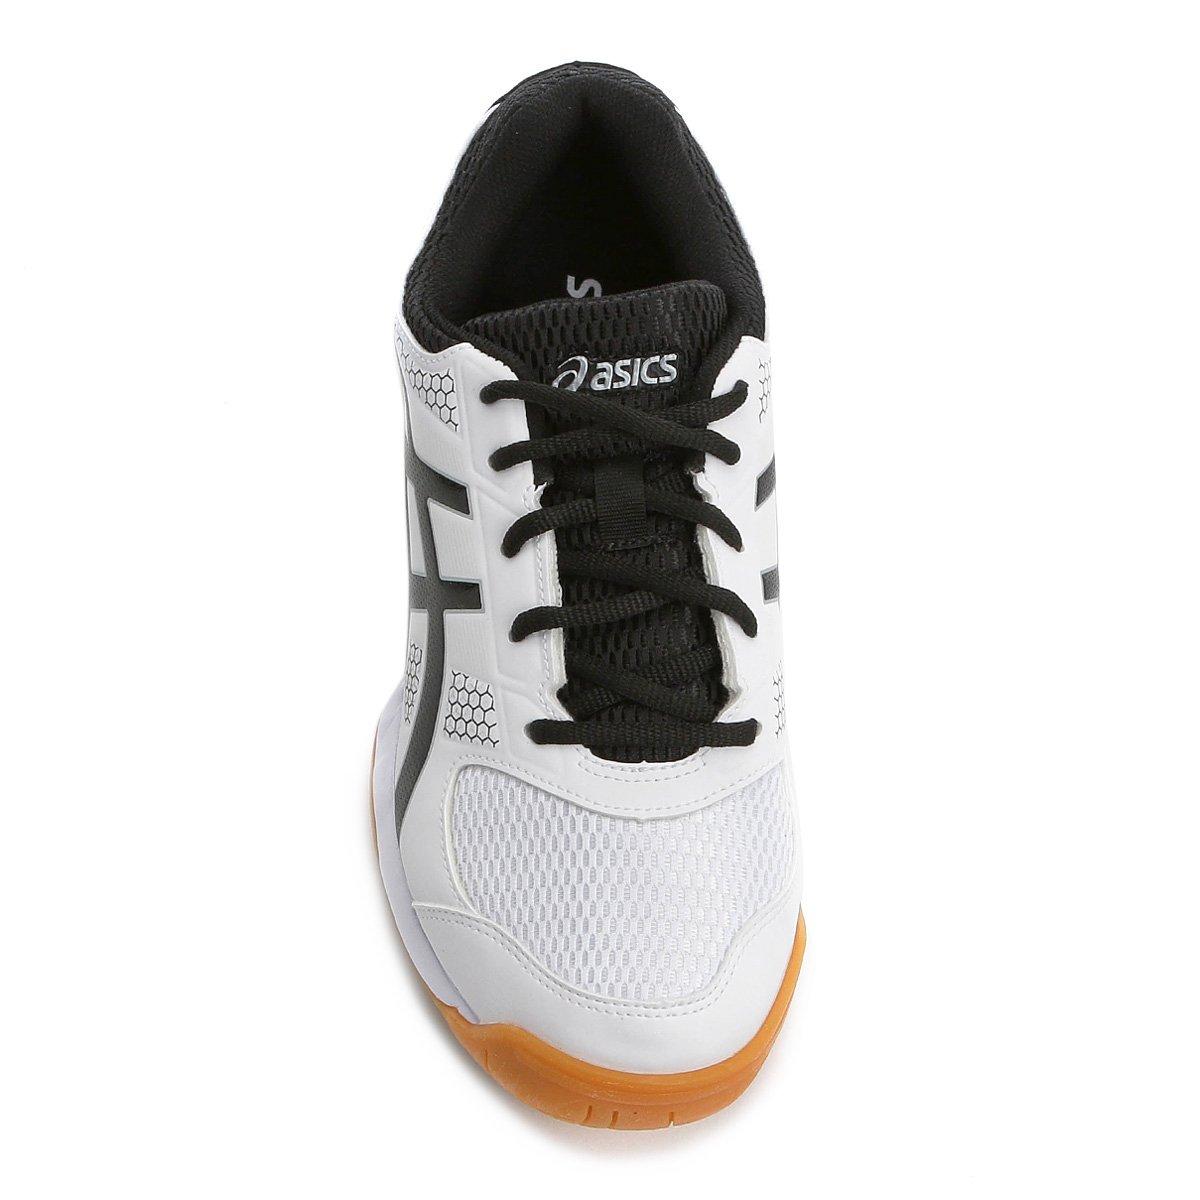 Tênis Asics Gel-Rocket 8A Masculino - Branco e prata - Compre Agora ... 0636216f003d9